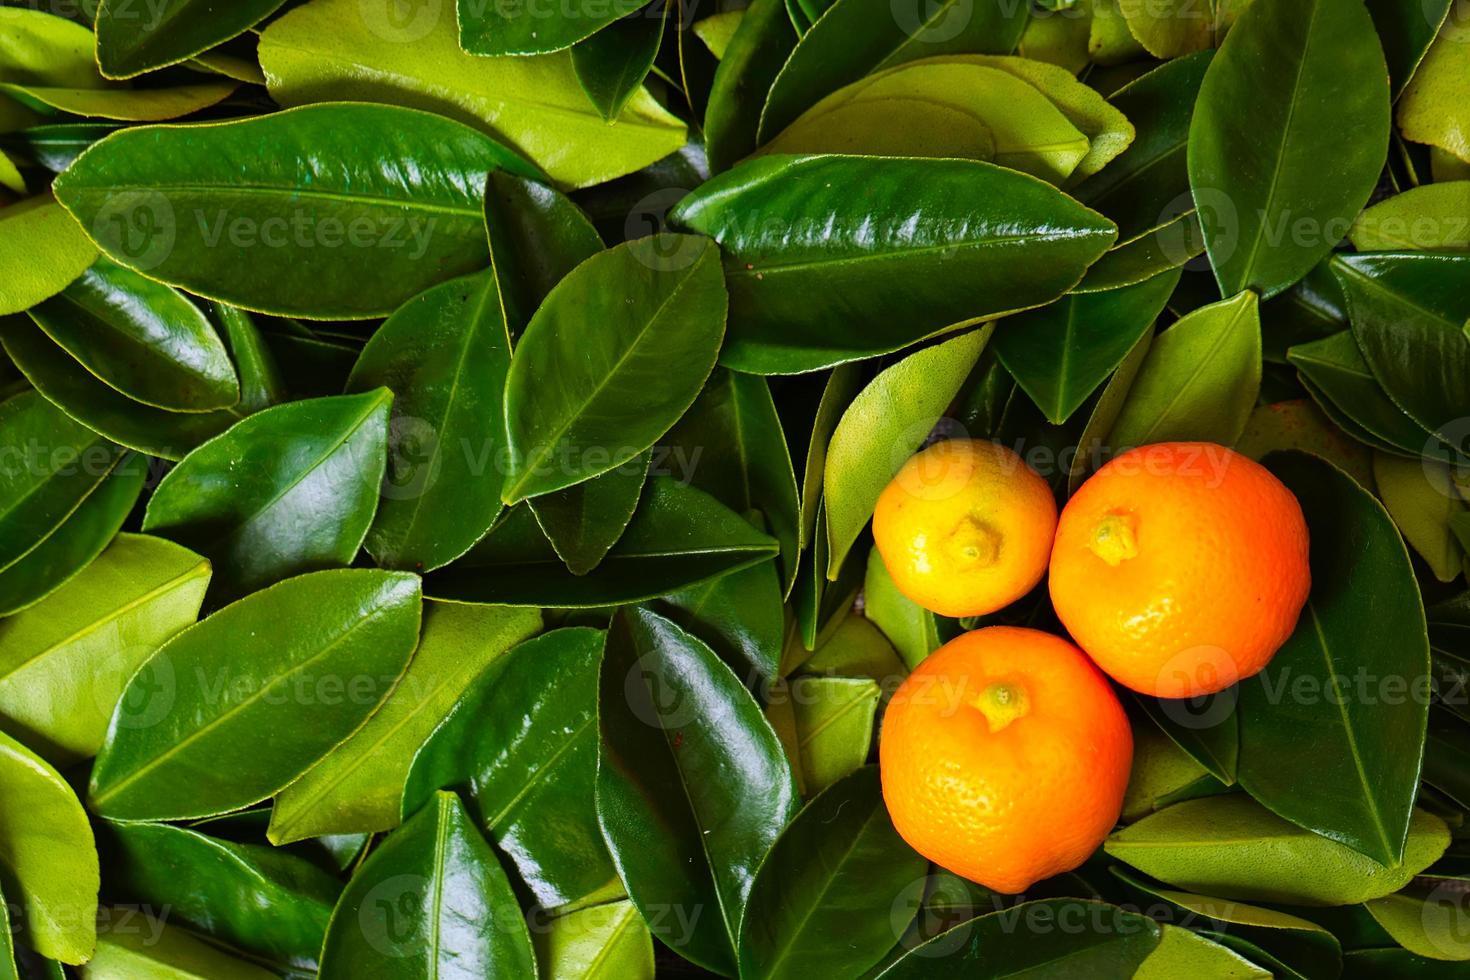 Calamondin citrus fruits photo